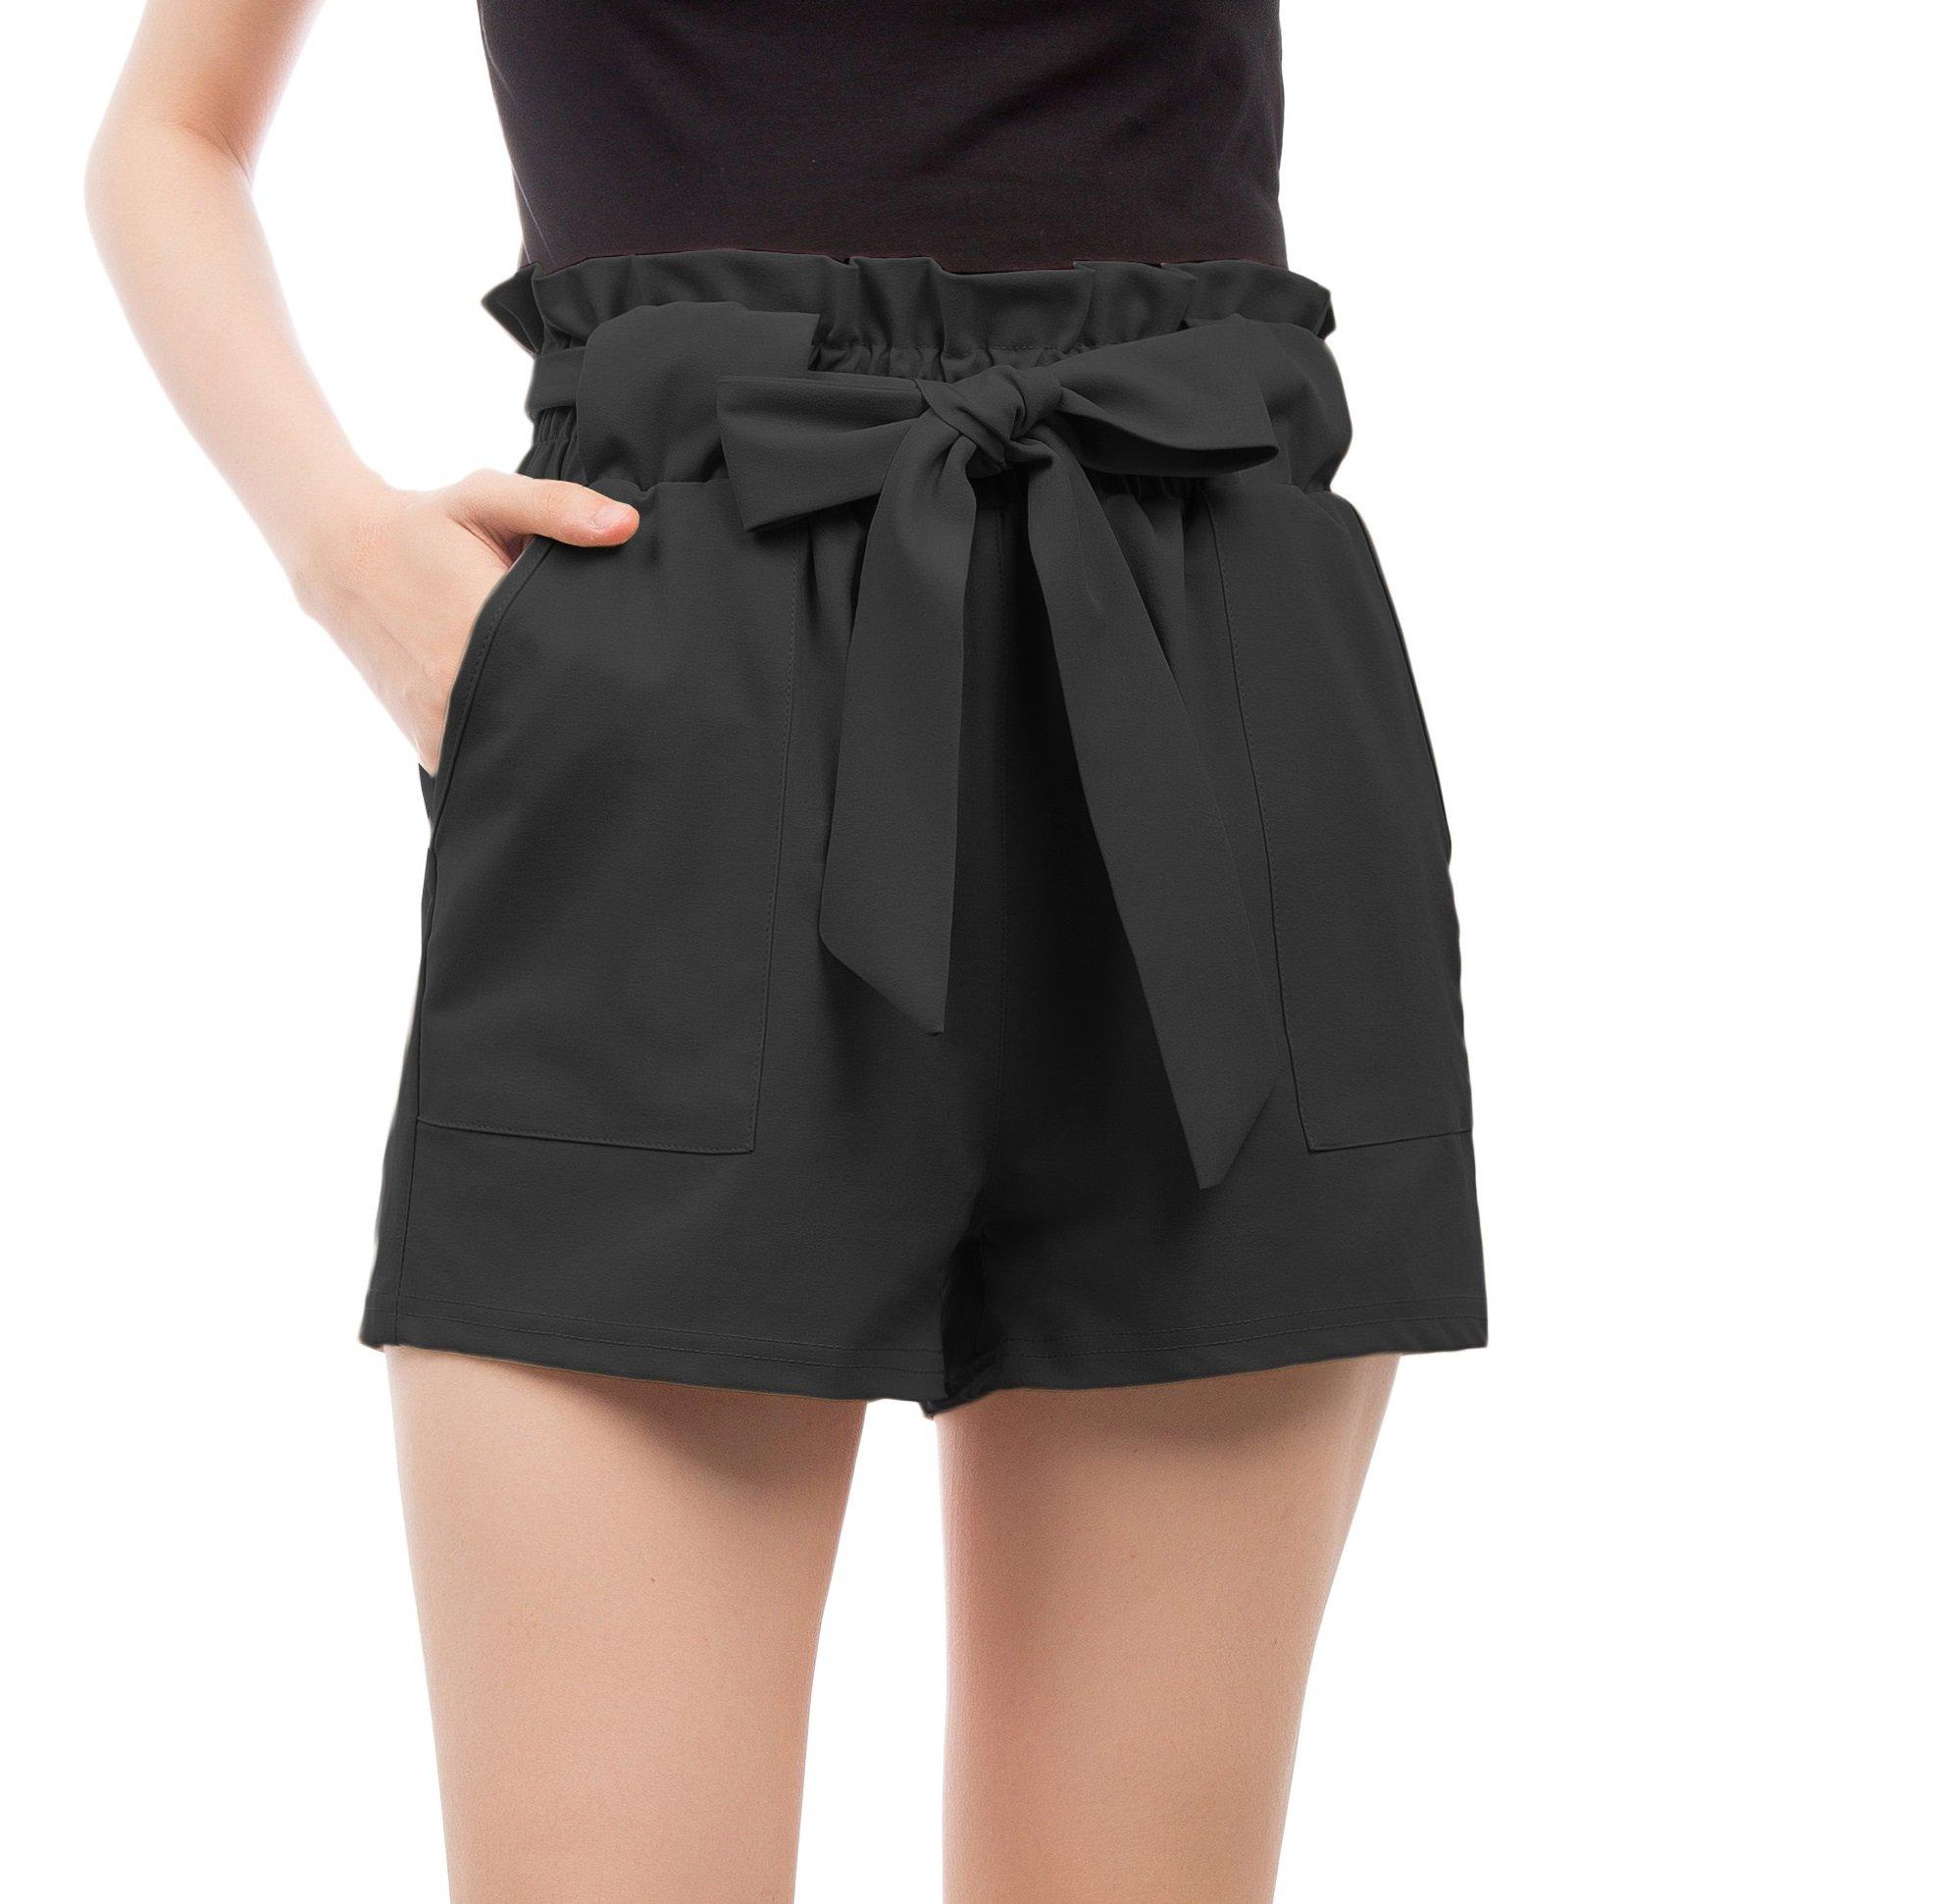 GRACE KARIN Women's High Waist Casual Frill Bowknot Shorts L Black-2